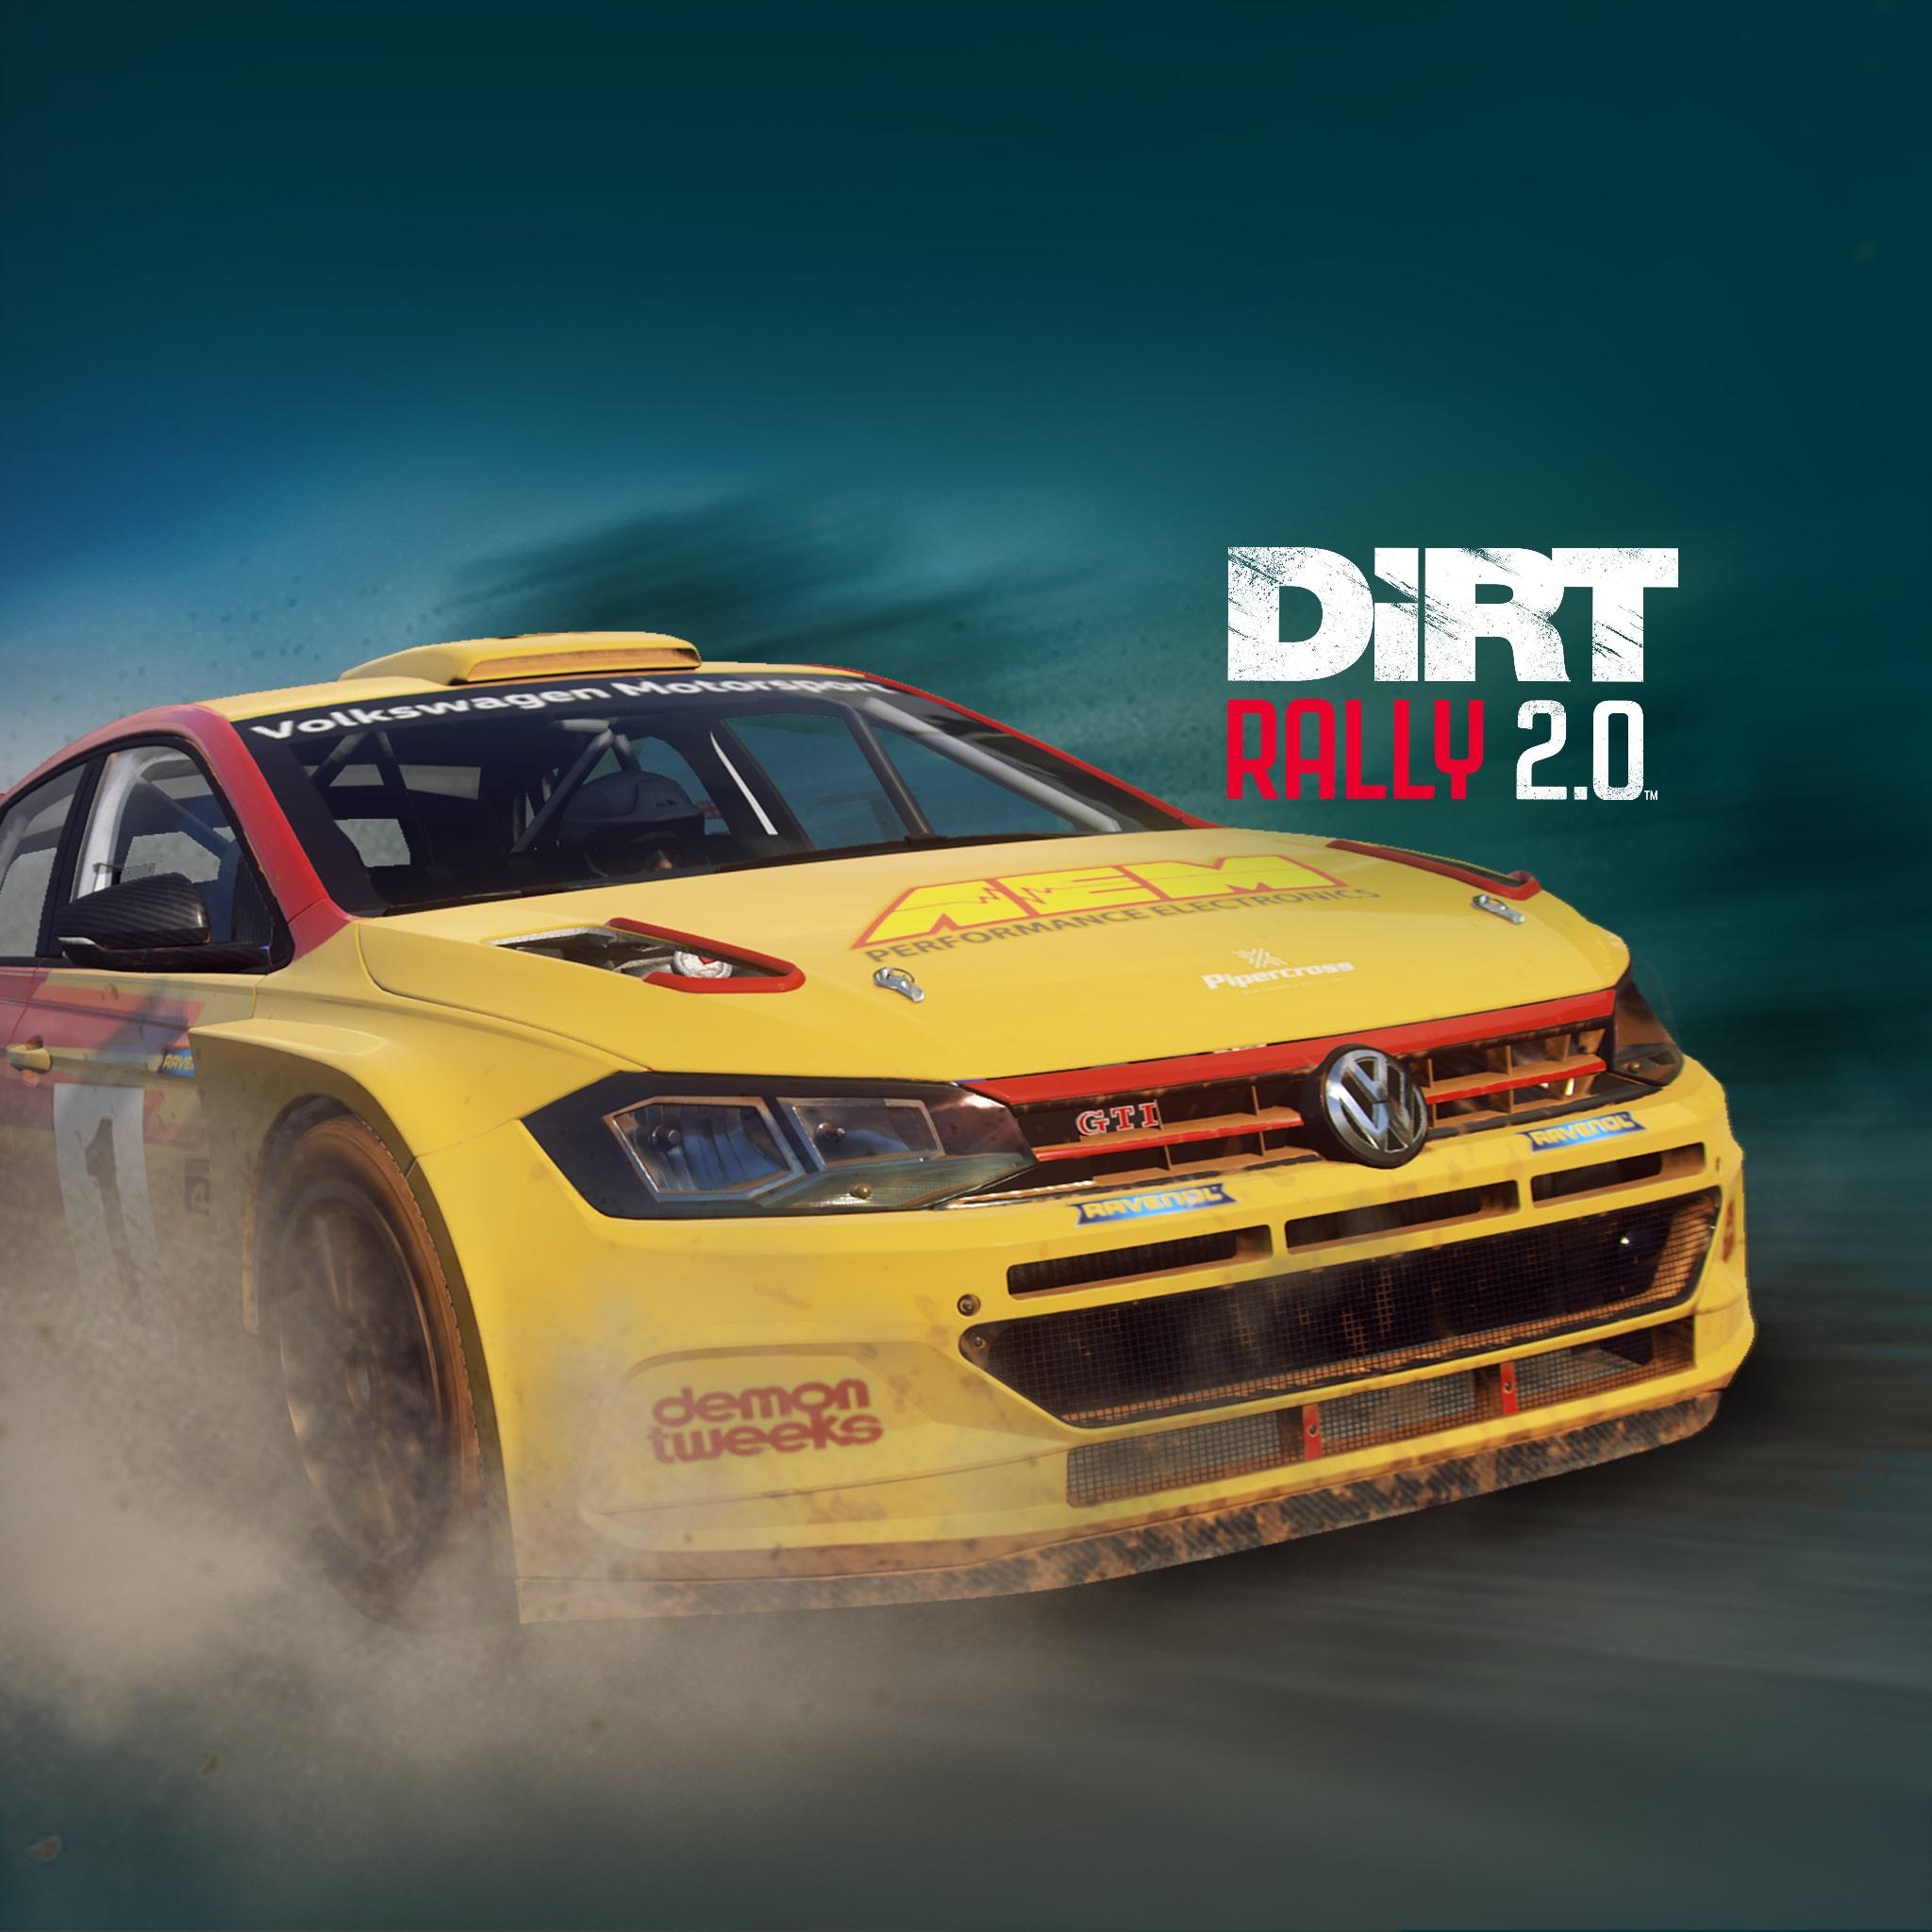 DiRT Rally 2.0 - Season 4 - Stage 1 Liveries